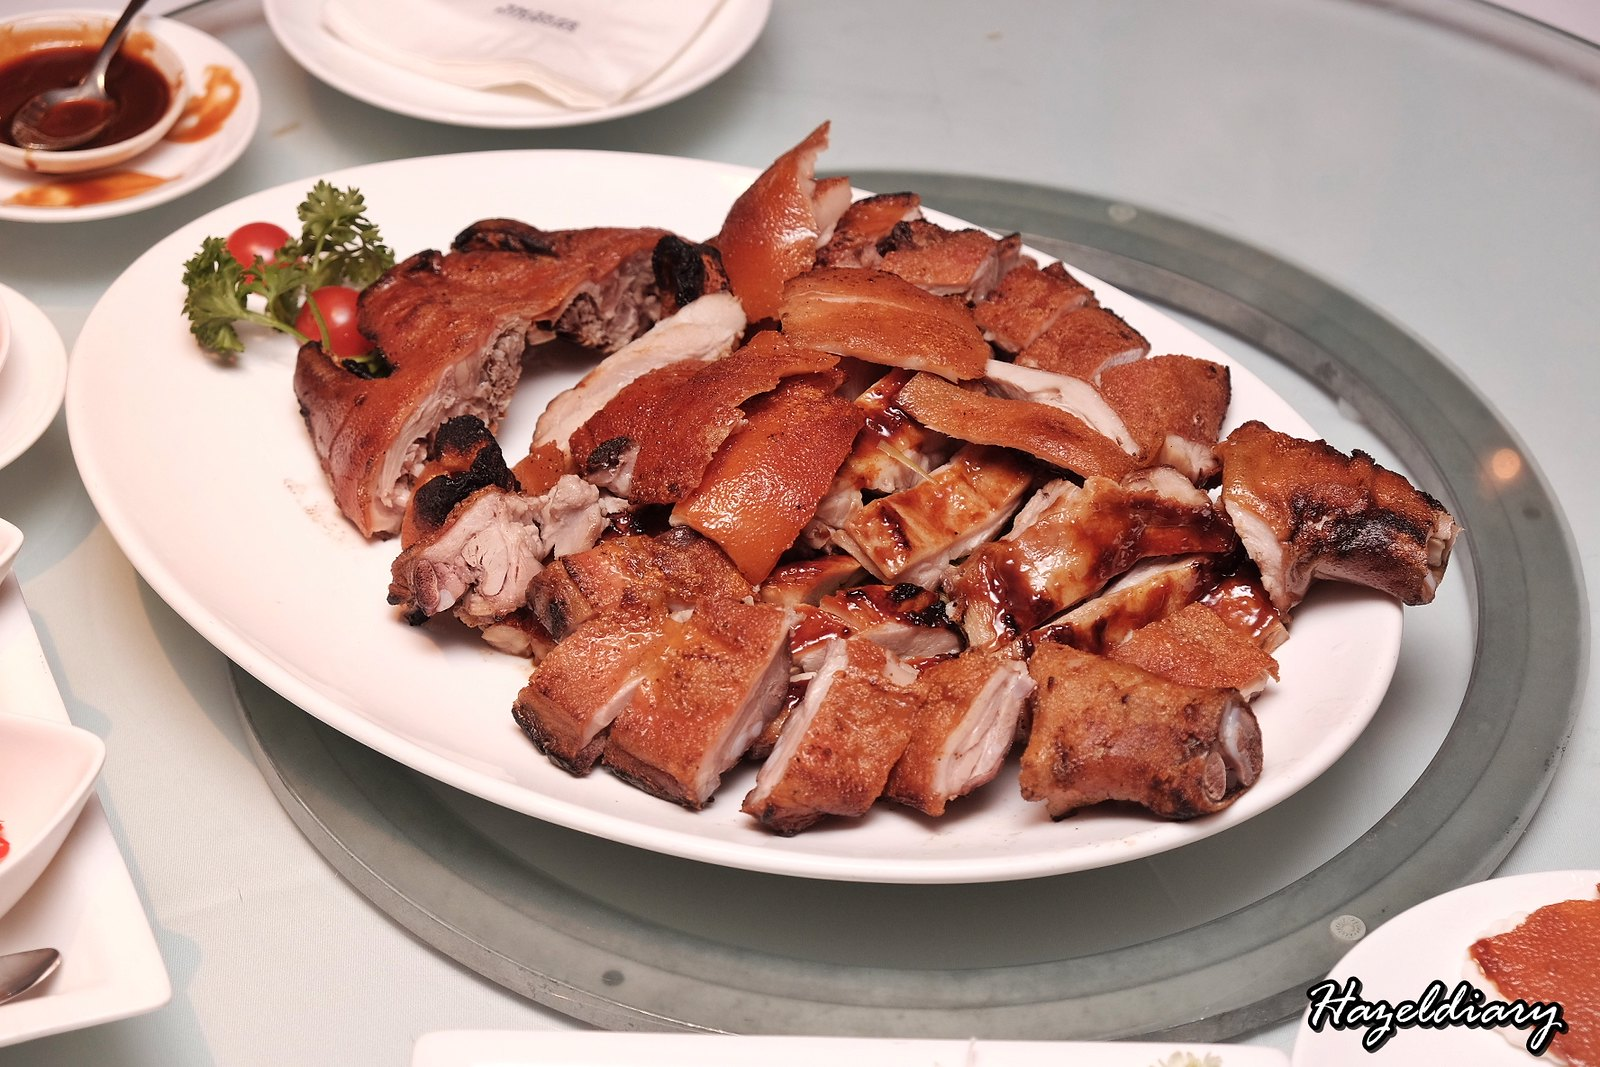 Yan Cantonese Cuisine-Roasted Suckling Pig